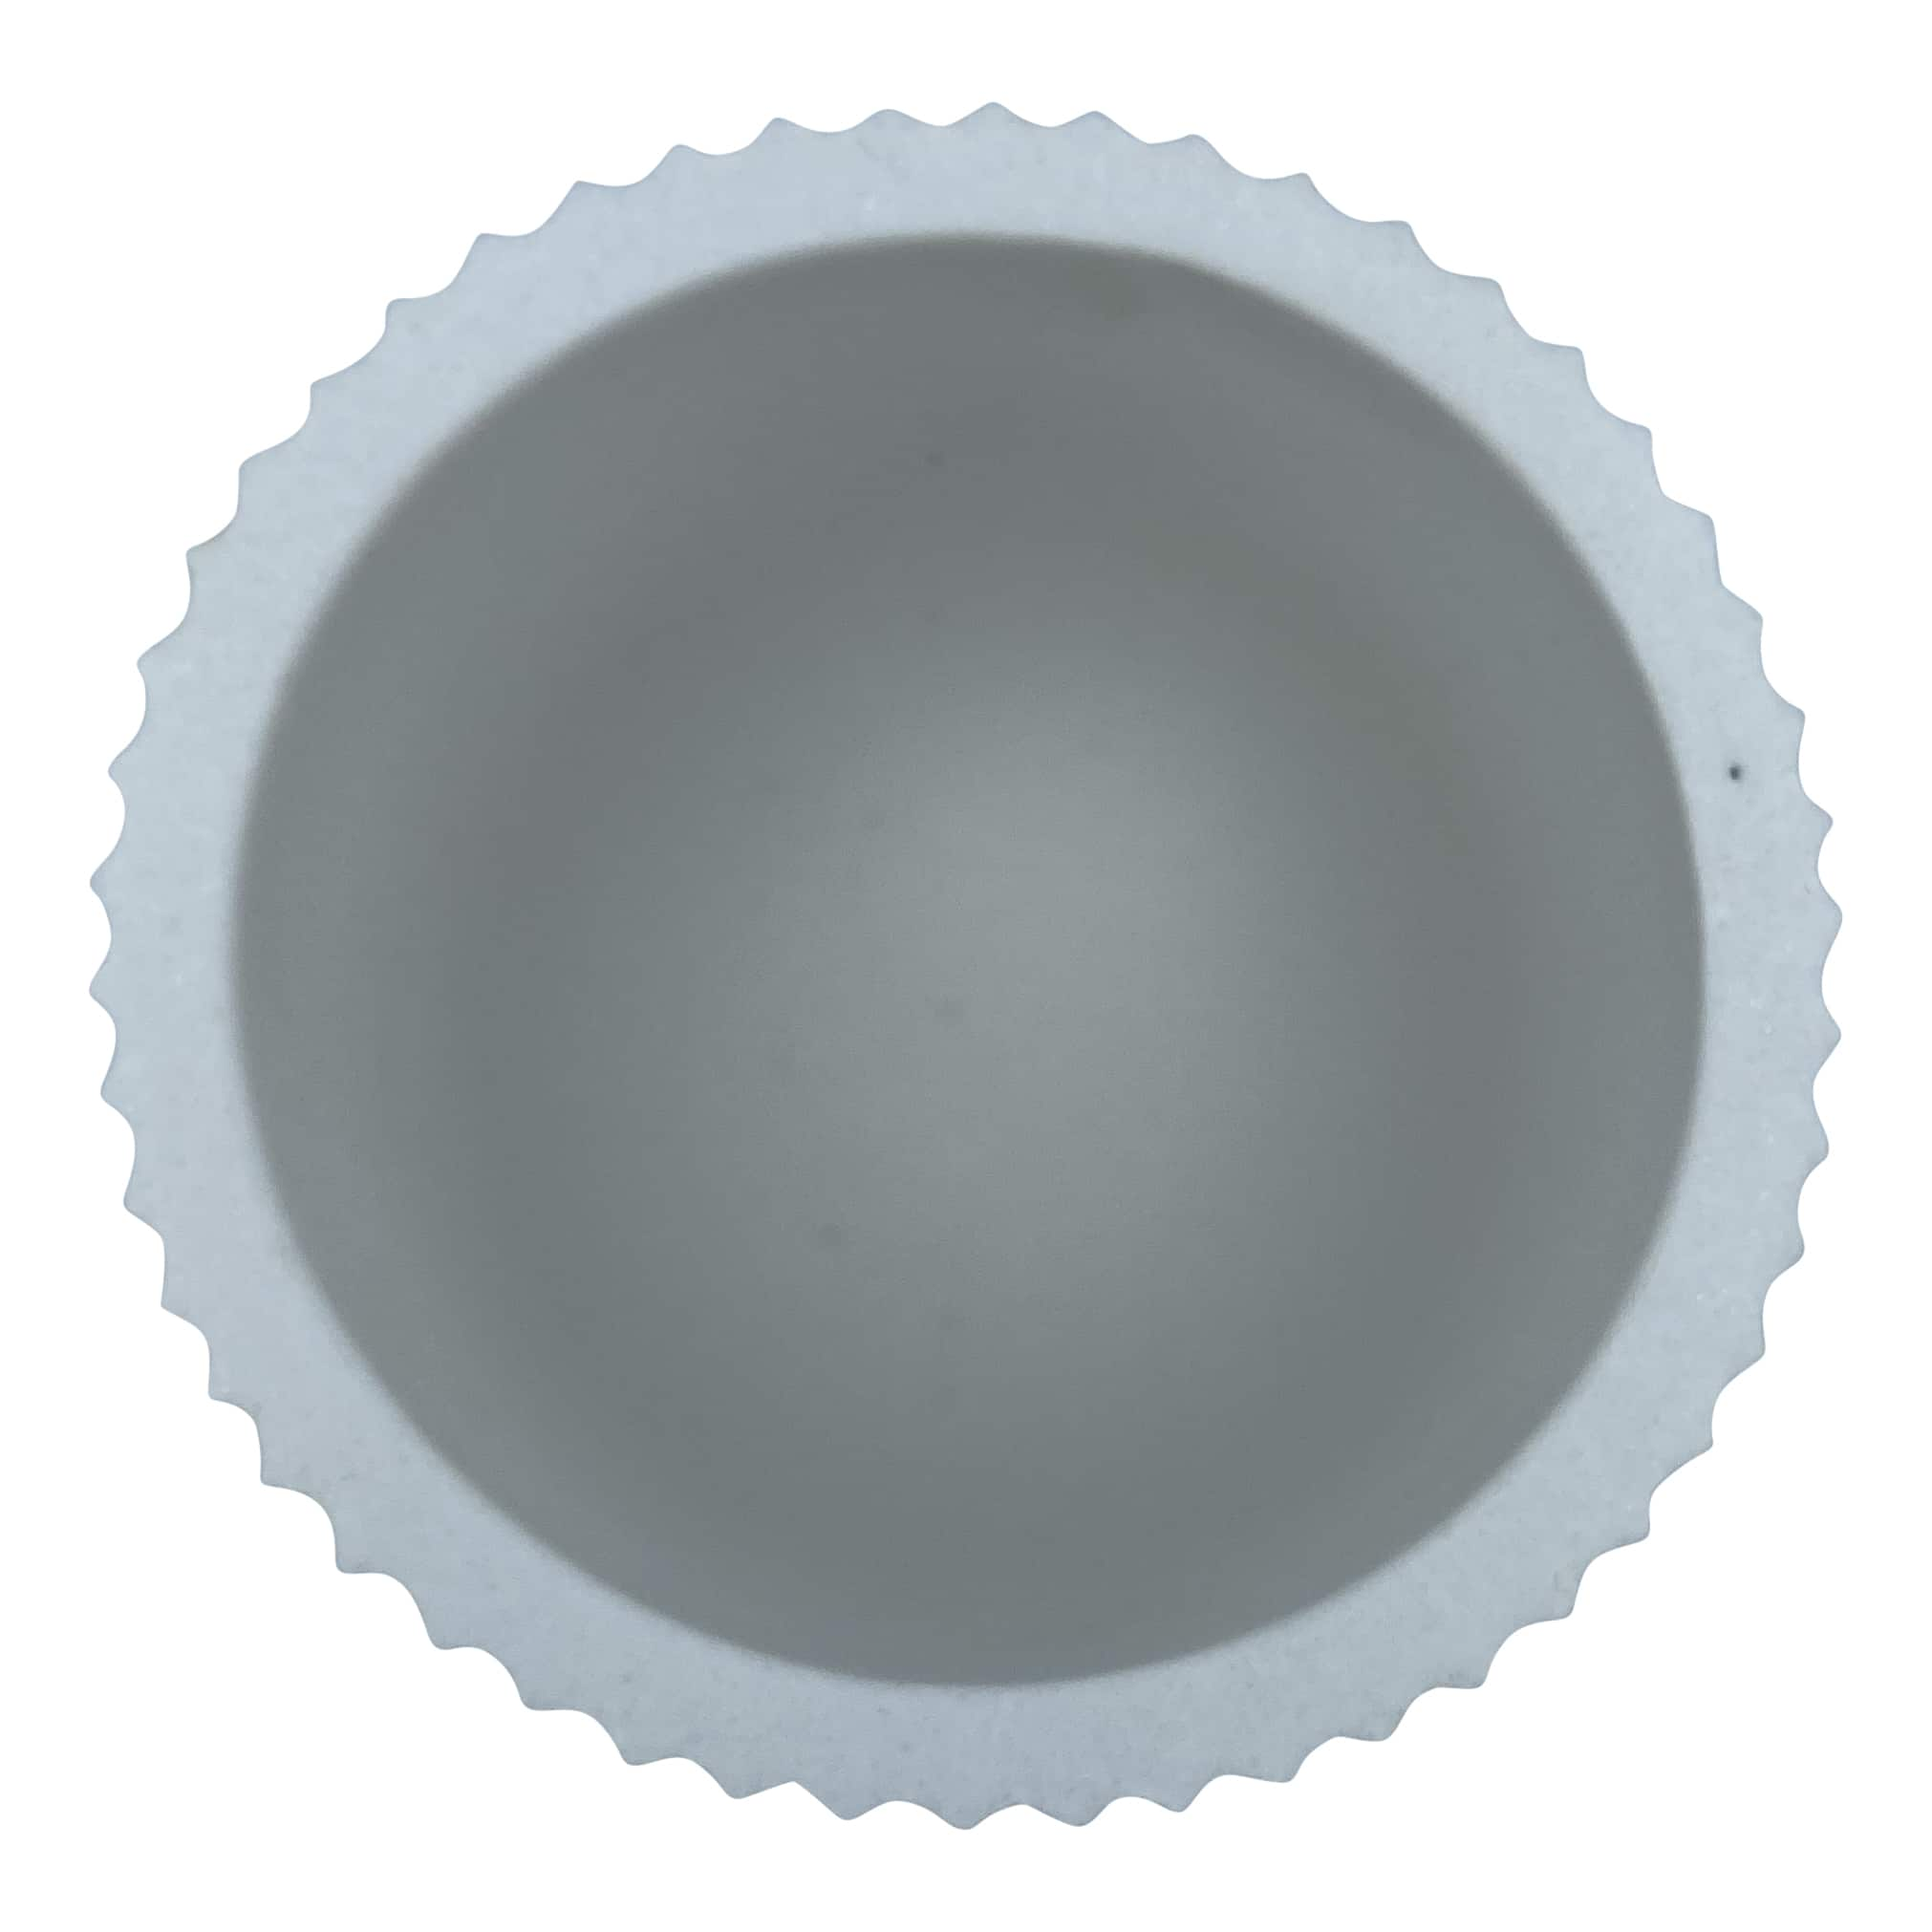 4goodz toiletborstel polyresin gefreesd - Wit